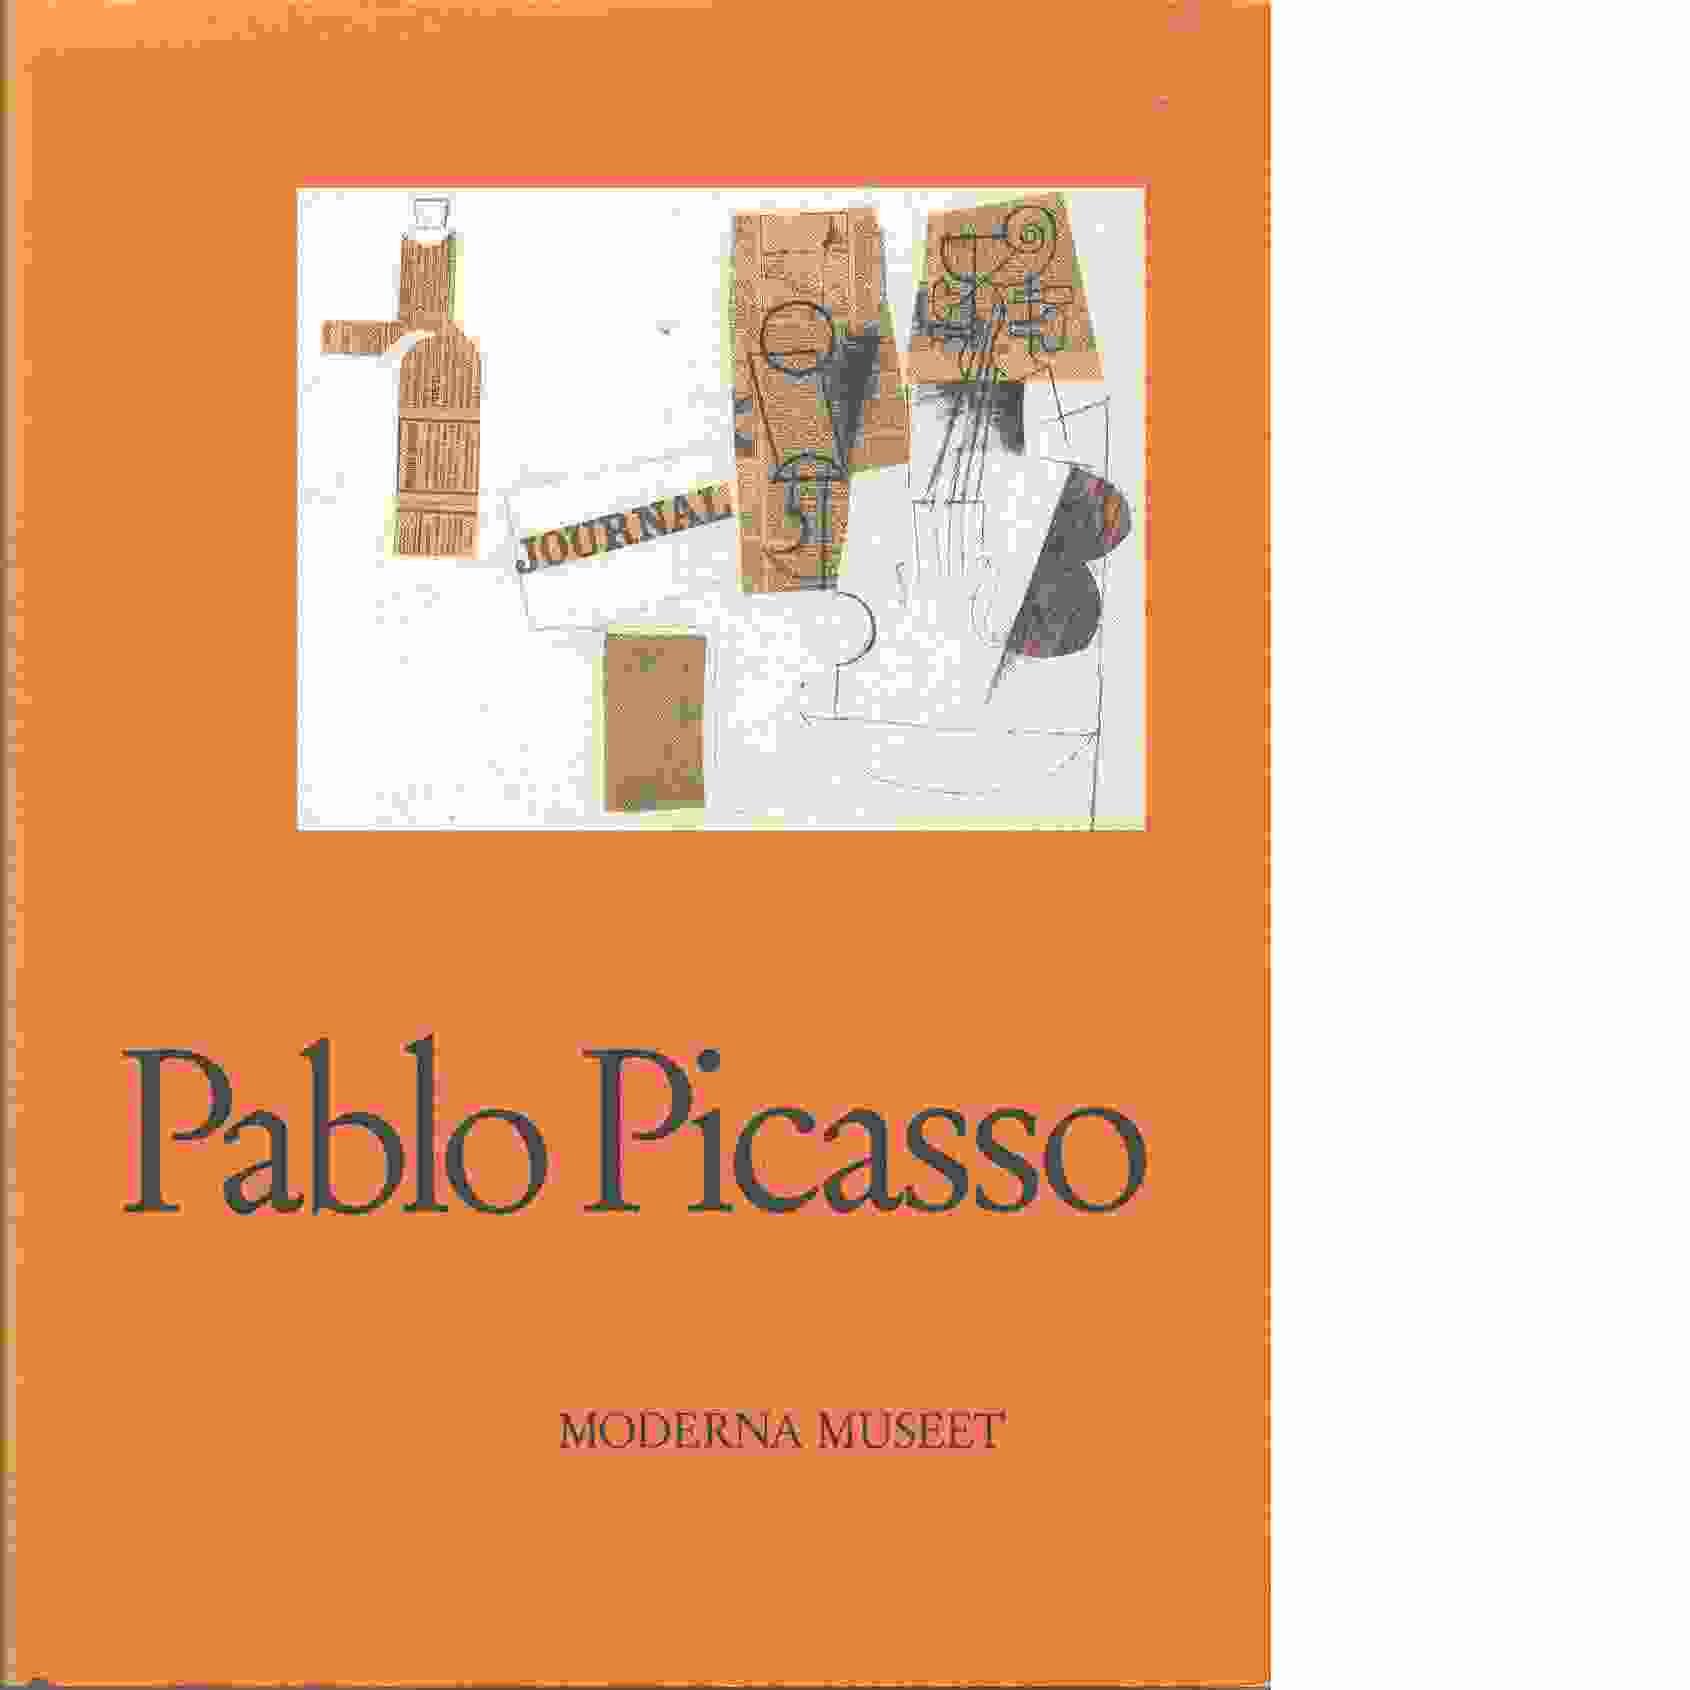 Pablo Picasso : [Moderna museet, Stockholm 15/10 1988-8/1 1989] - Picasso, Pablo konstnär